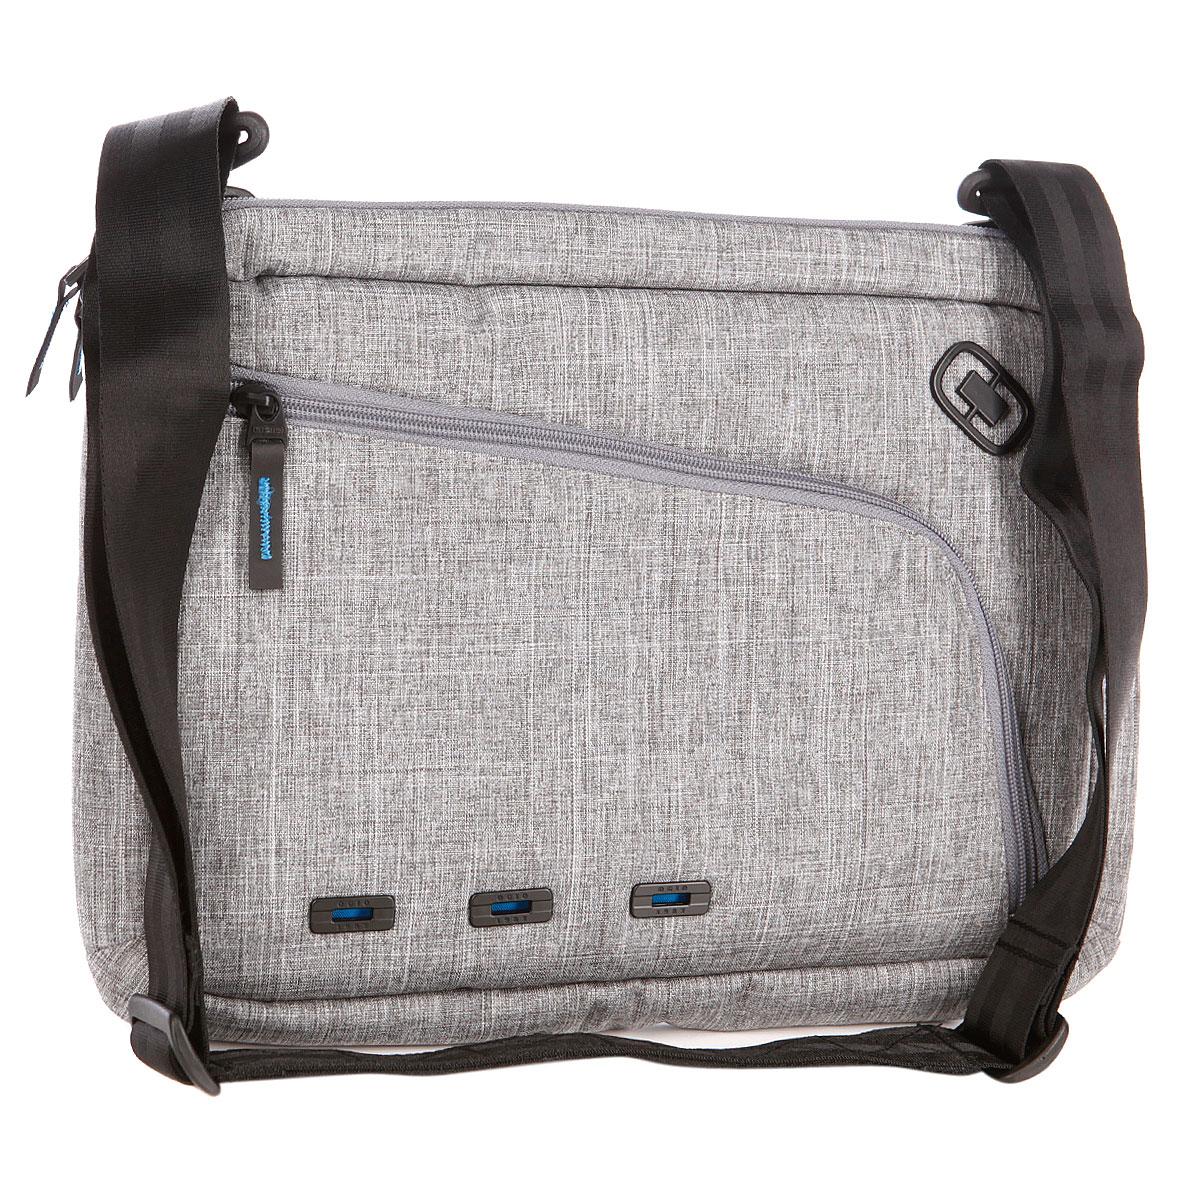 Сумка для ноутбука Ogio  Newt Slim Case , до 15 , цвет: серый, 10 л - Сумки